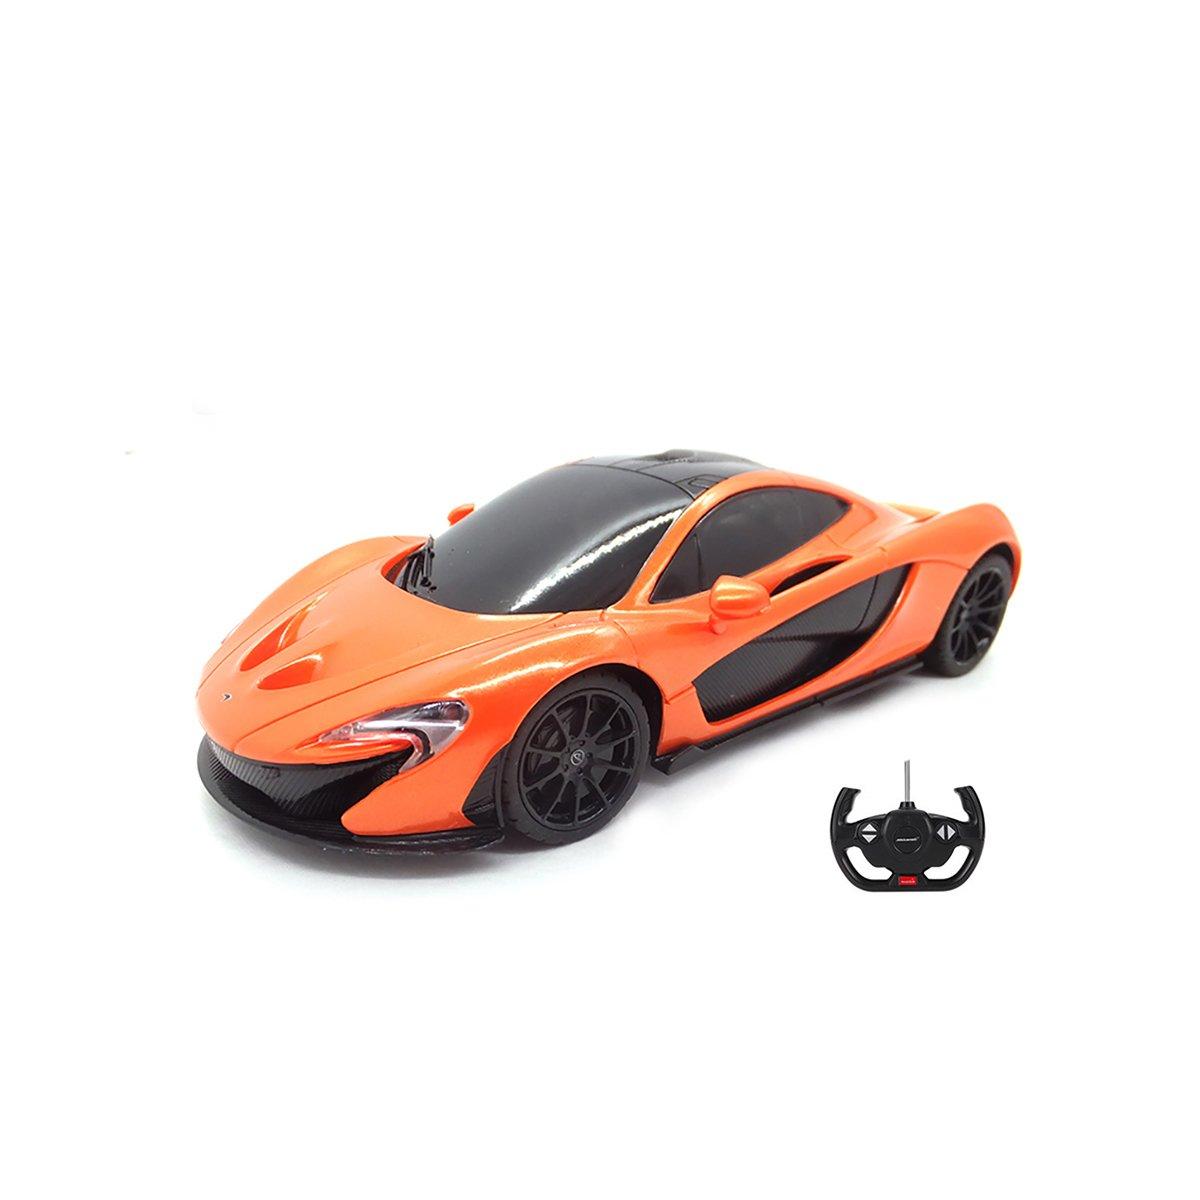 Masina cu telecomanda Rastar McLaren P1 RC, 1:24, Portocaliu